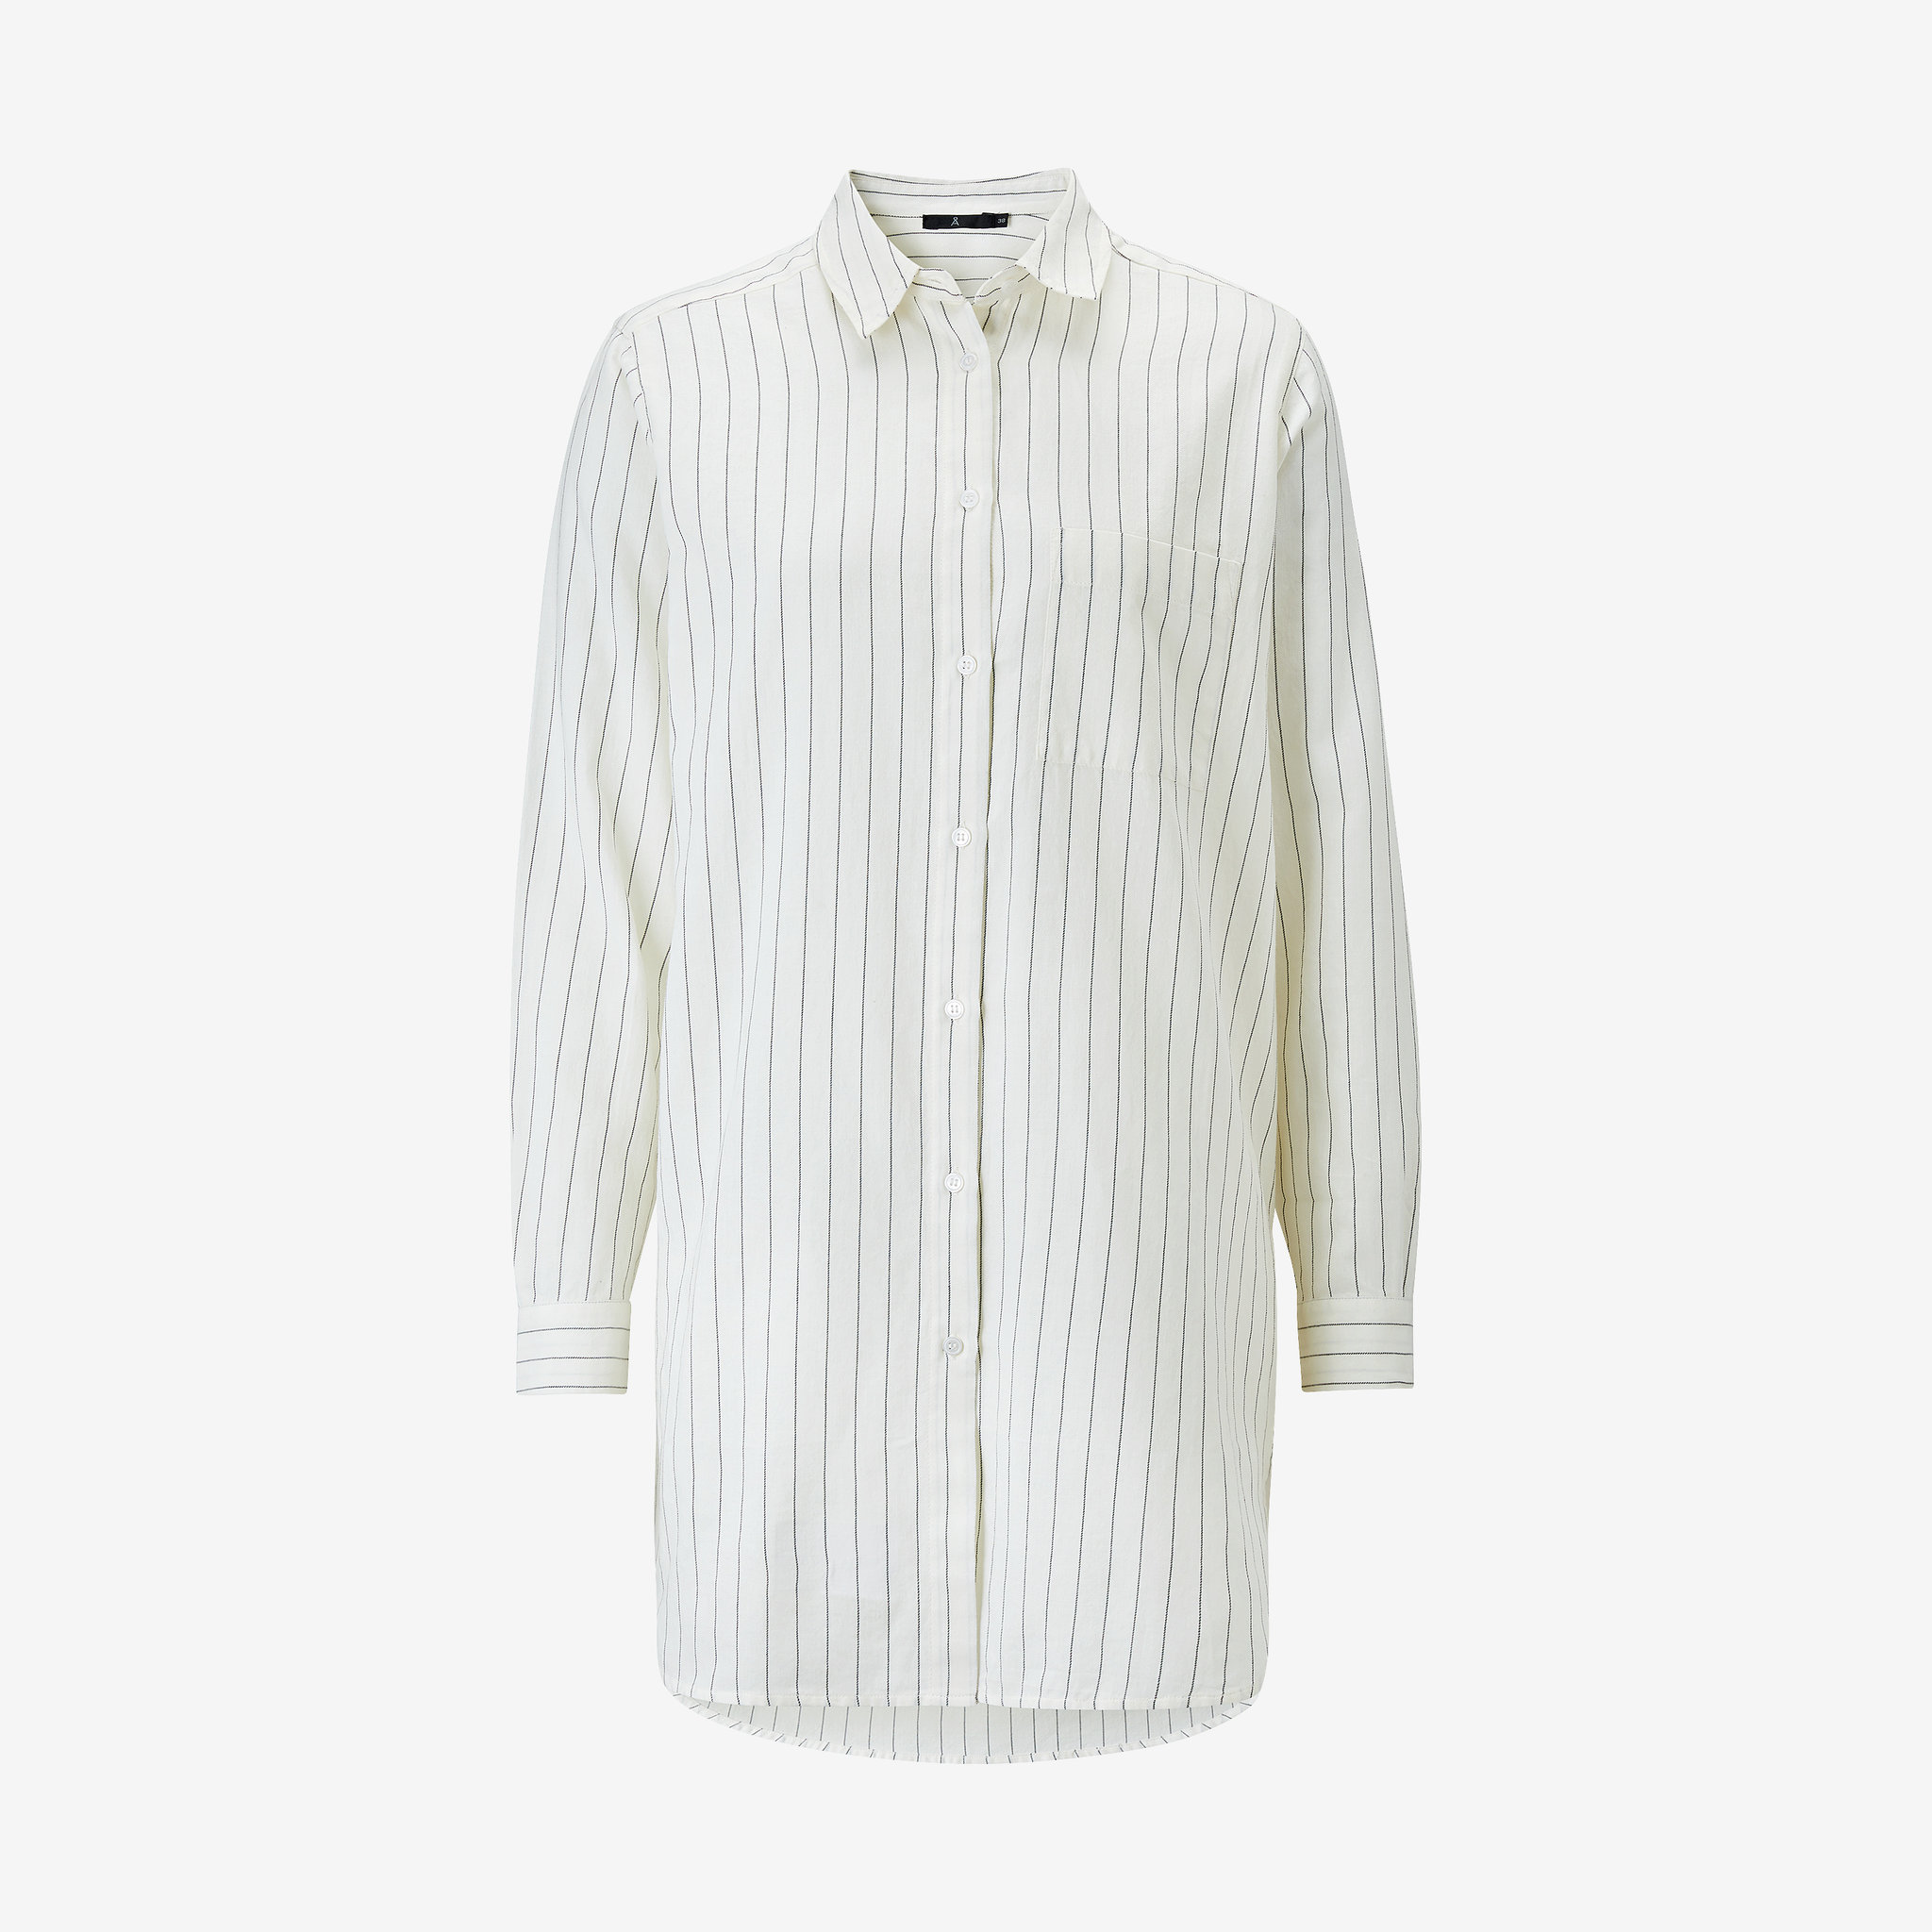 Skjorta - Blusar   skjortor- Köp online på åhlens.se! 6377c8aec91a7